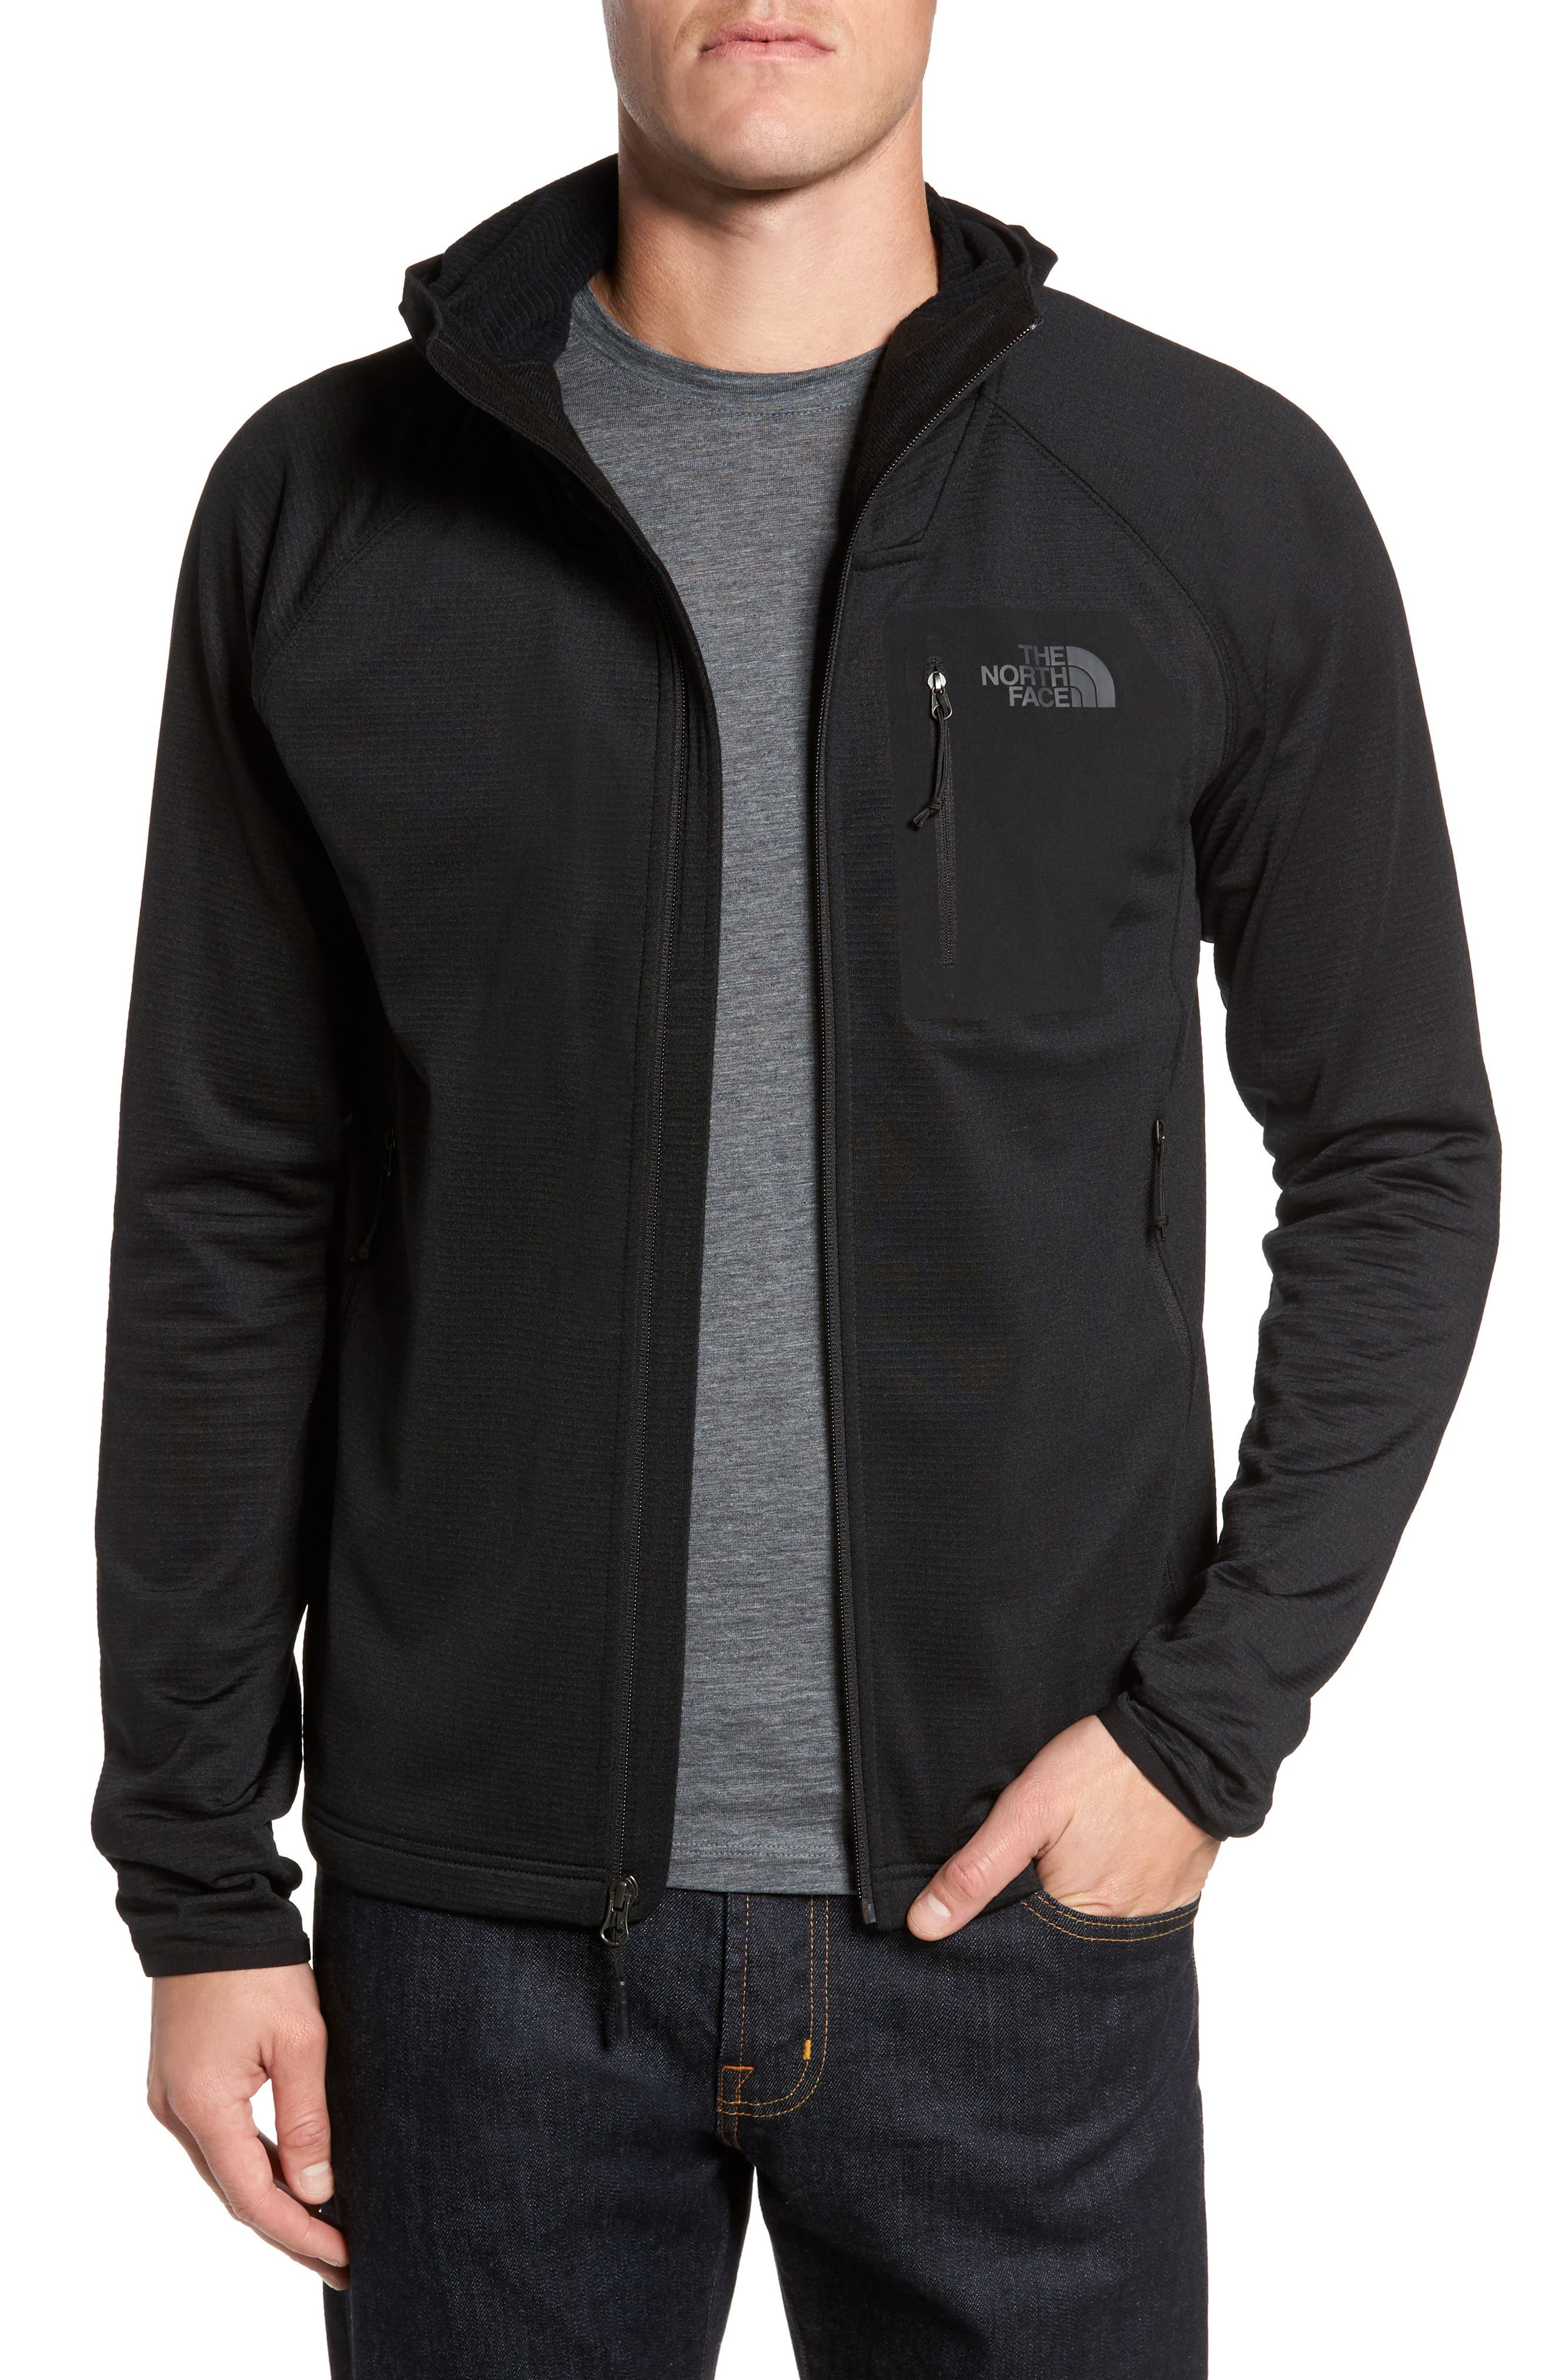 Borod Zip Fleece Jacket,                             Main thumbnail 1, color,                             BLACK/ BLACK